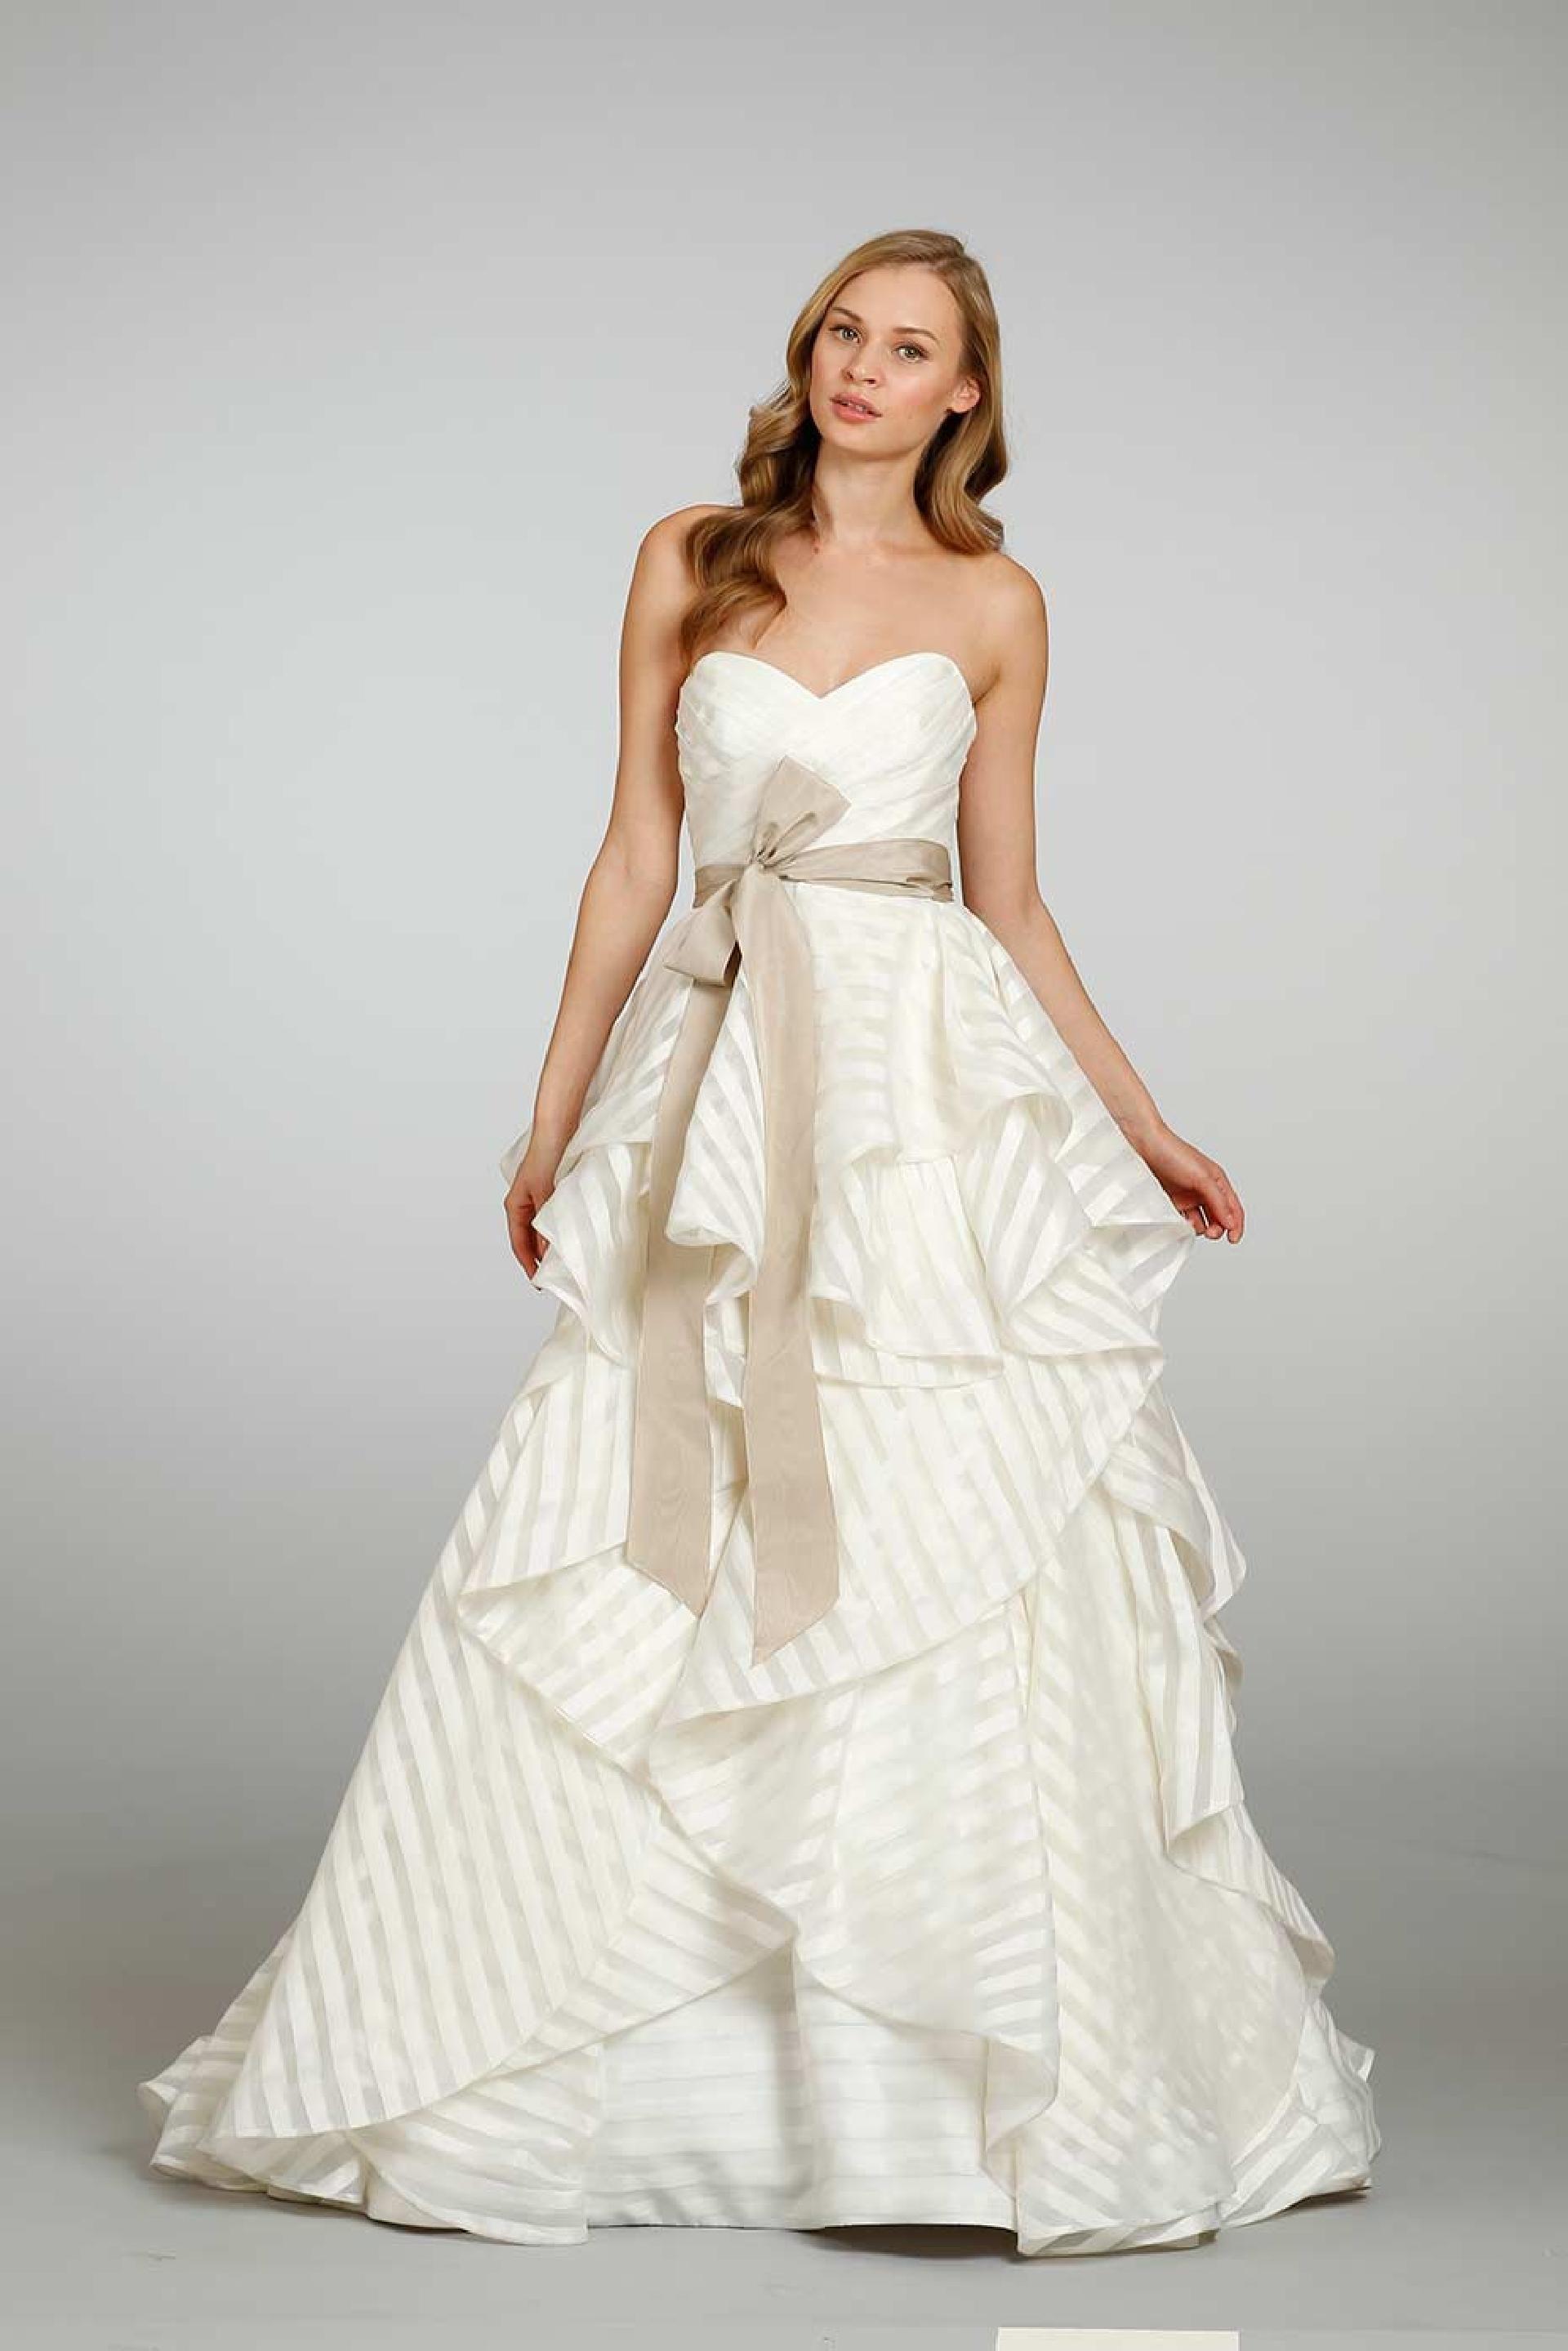 Hayley Paige Bridal Designer Wedding Dresses in SC | Parties Food ...